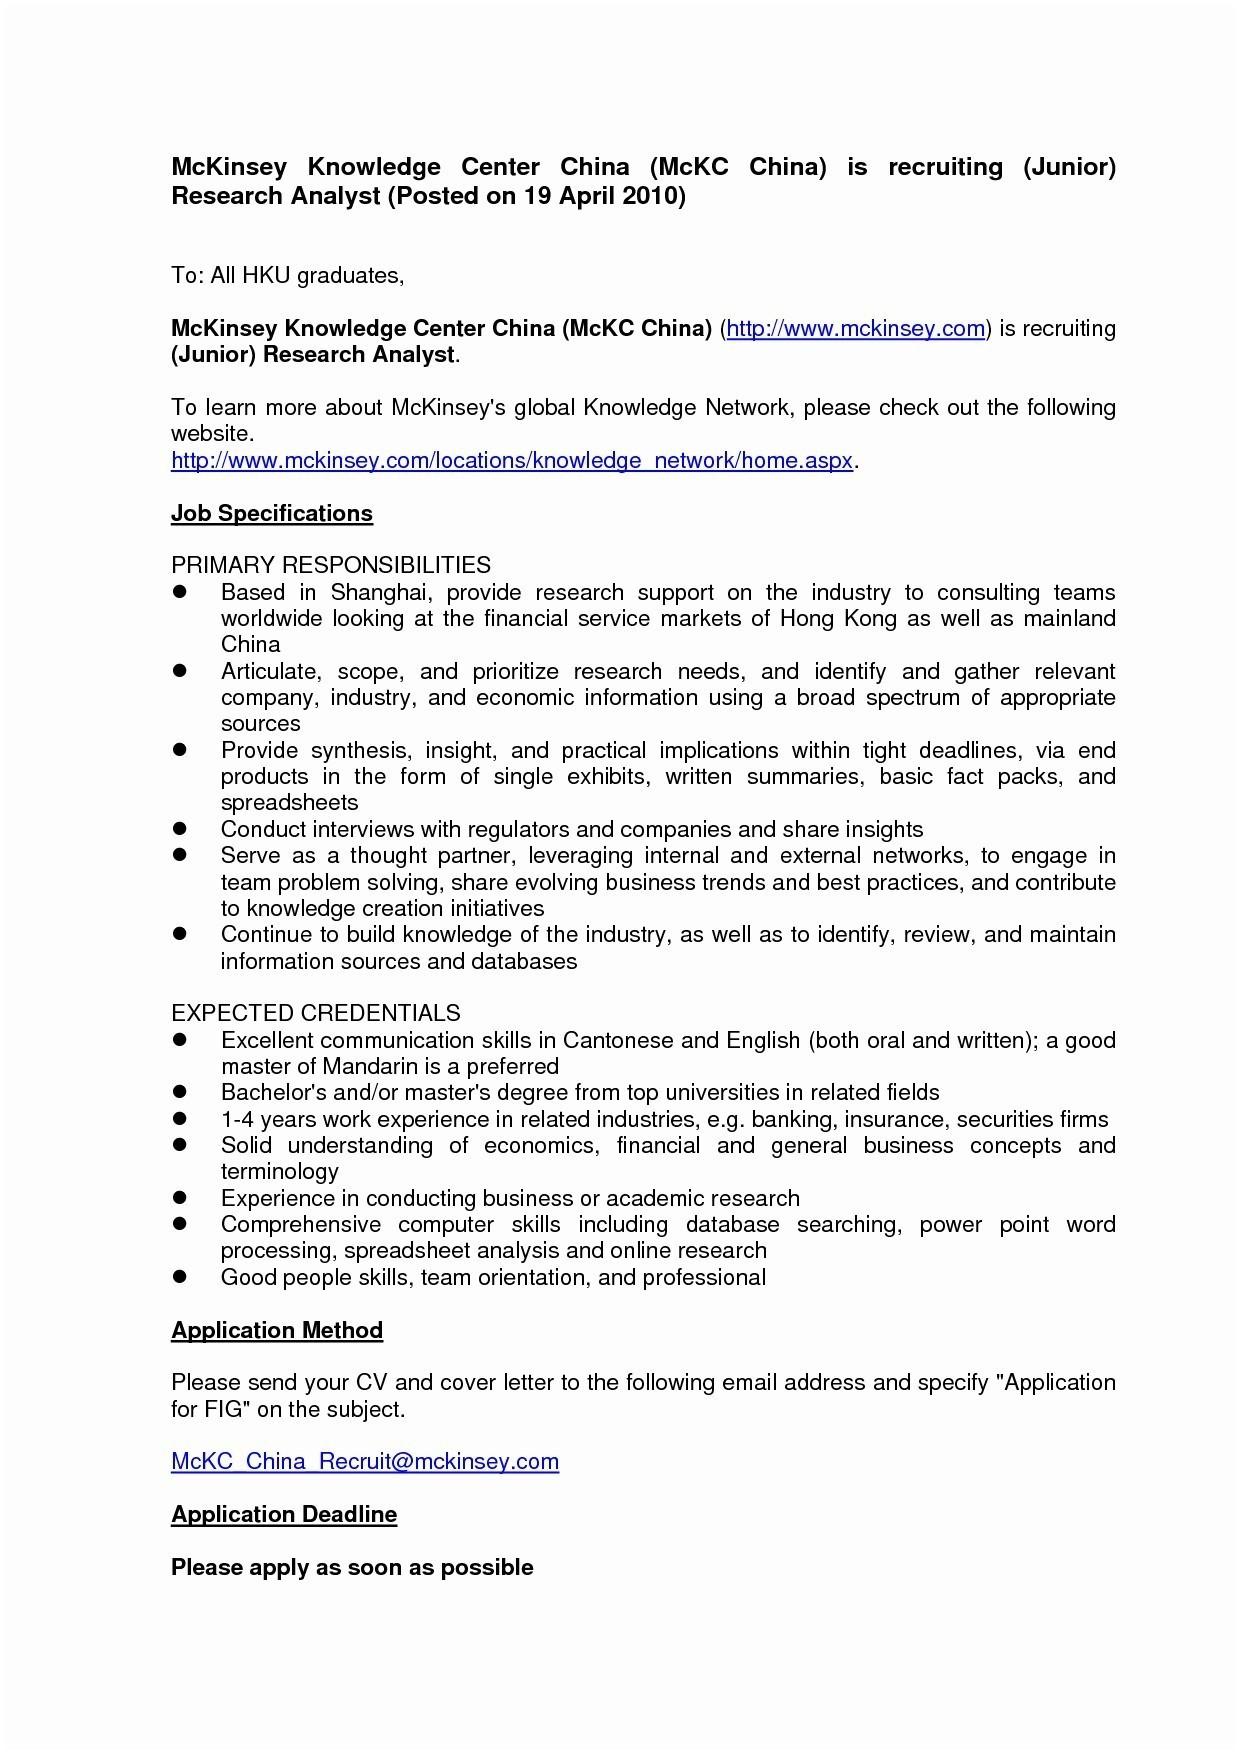 Creative Cover Letter Template - Sample Cover Letter for Creative Job Refrence Inspirational Job Fer